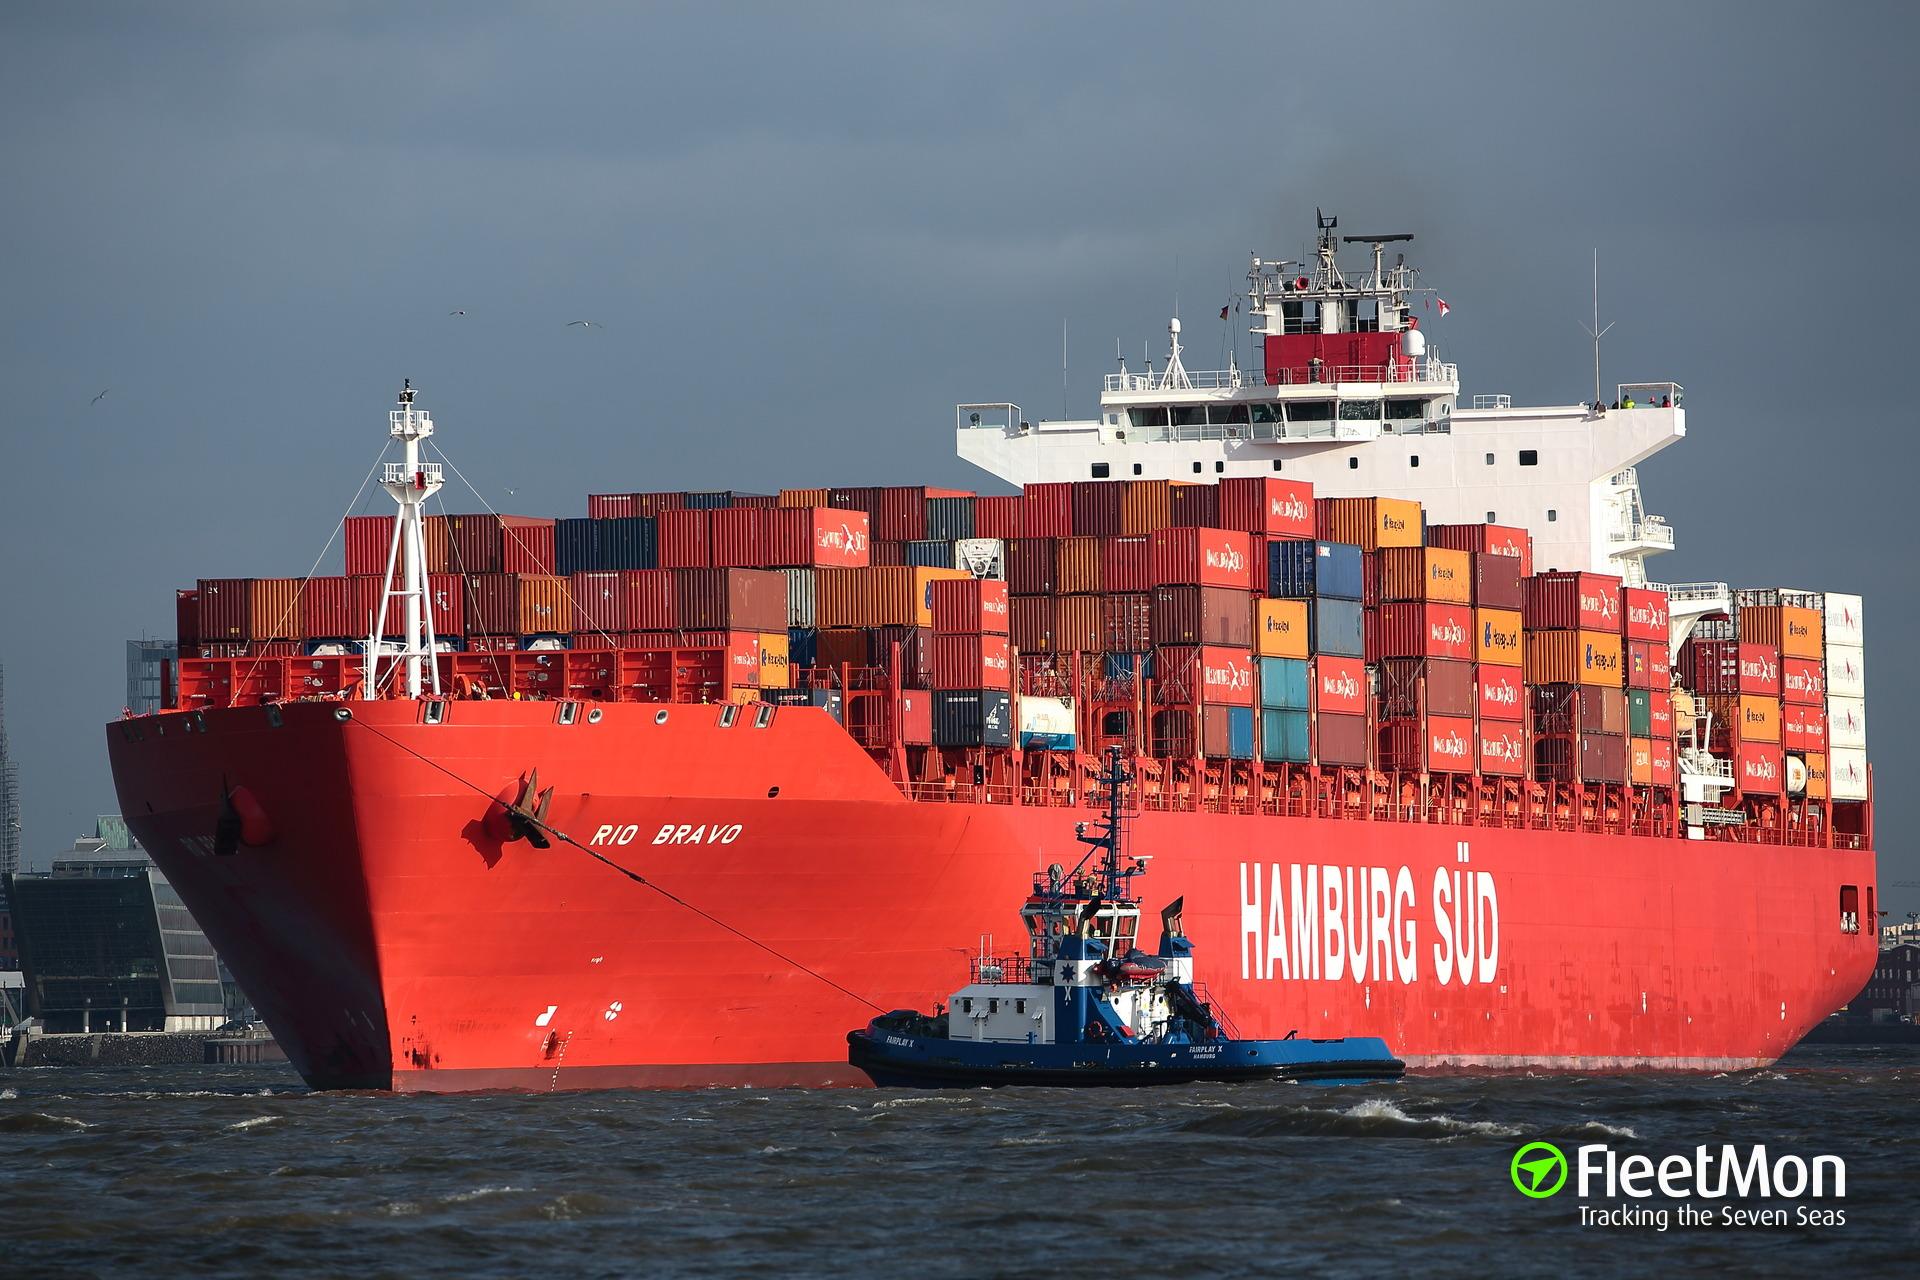 Rio Bravo Container Ship Imo 9348091